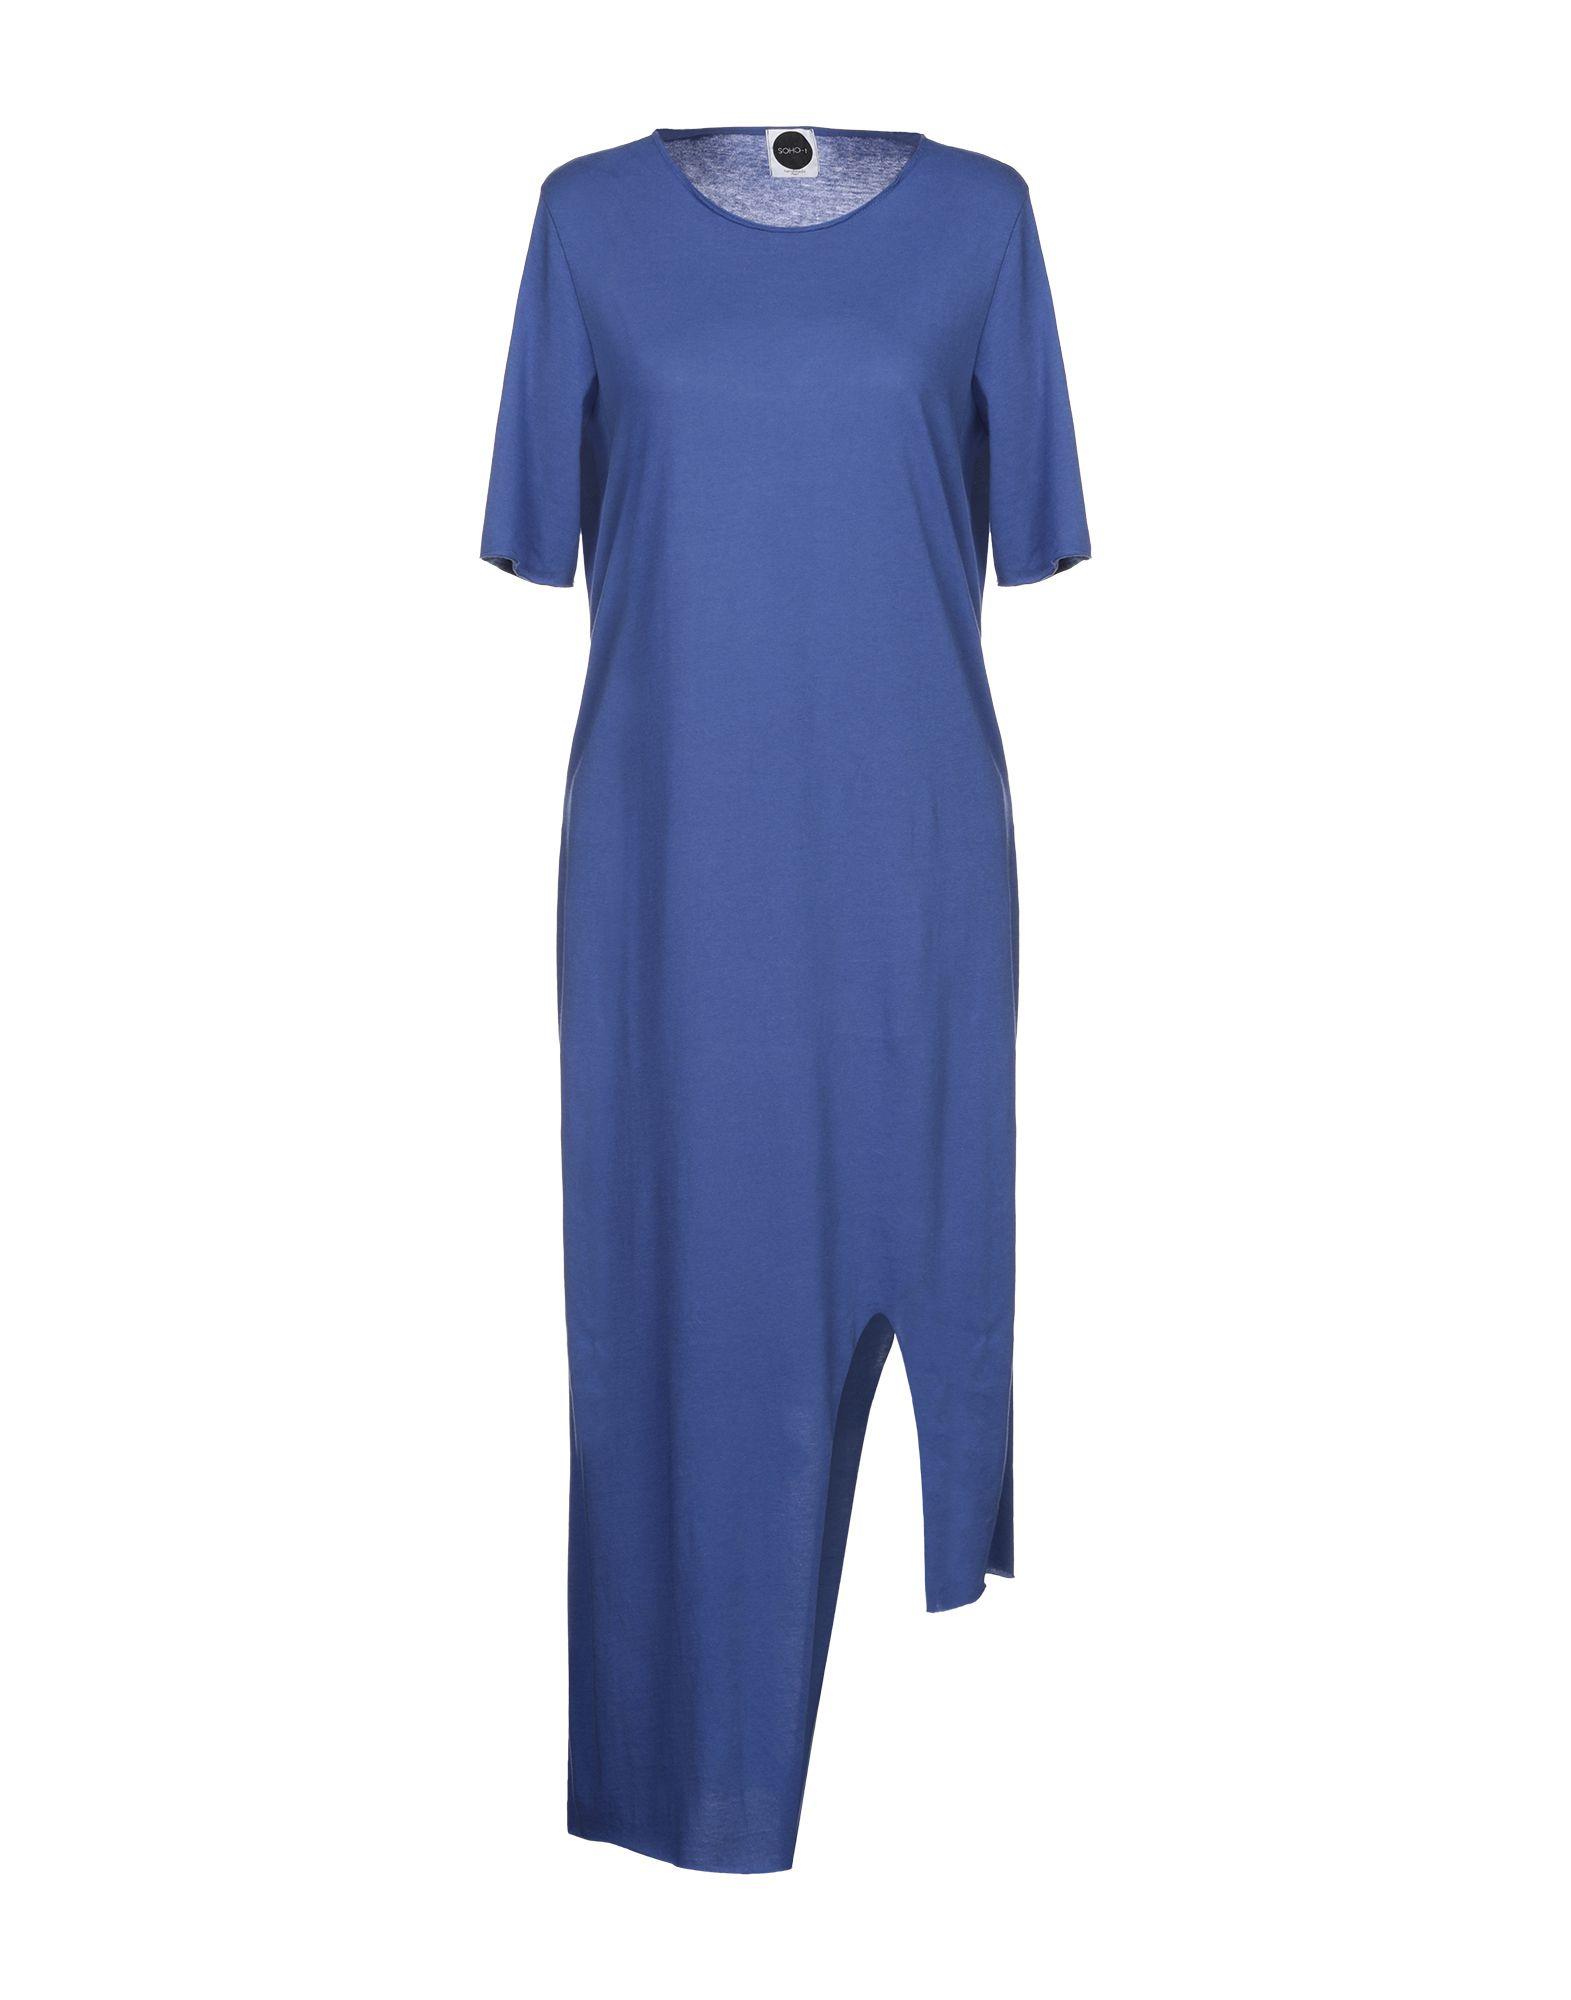 Фото - SOHO-T Платье длиной 3/4 платье madam t madam t mp002xw1hf72